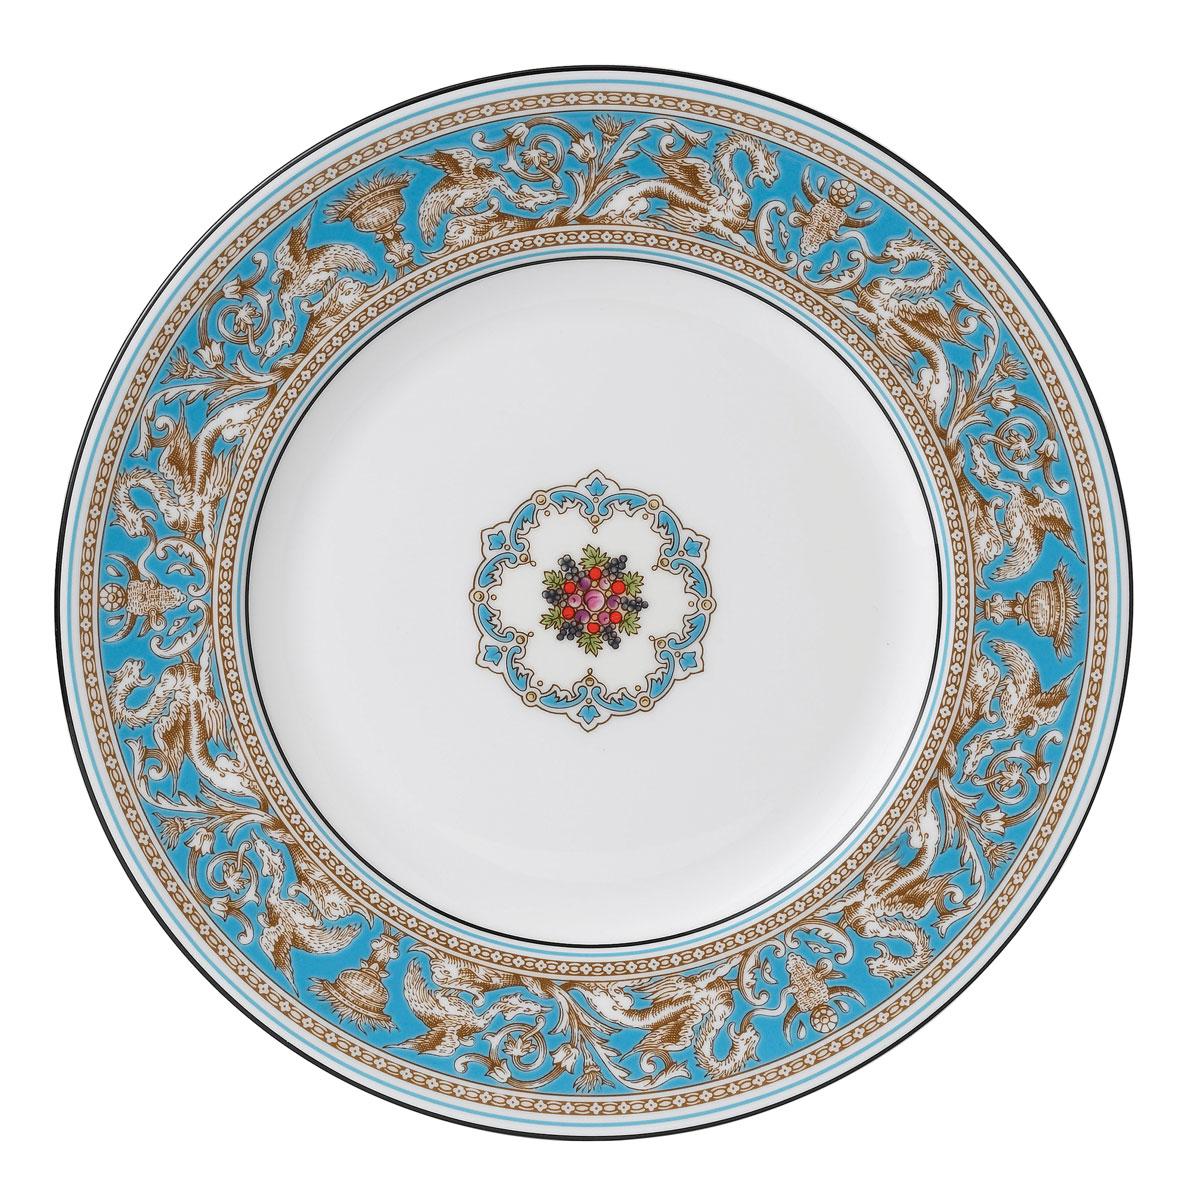 Wedgwood Florentine Turquoise Dinner Plate, Single